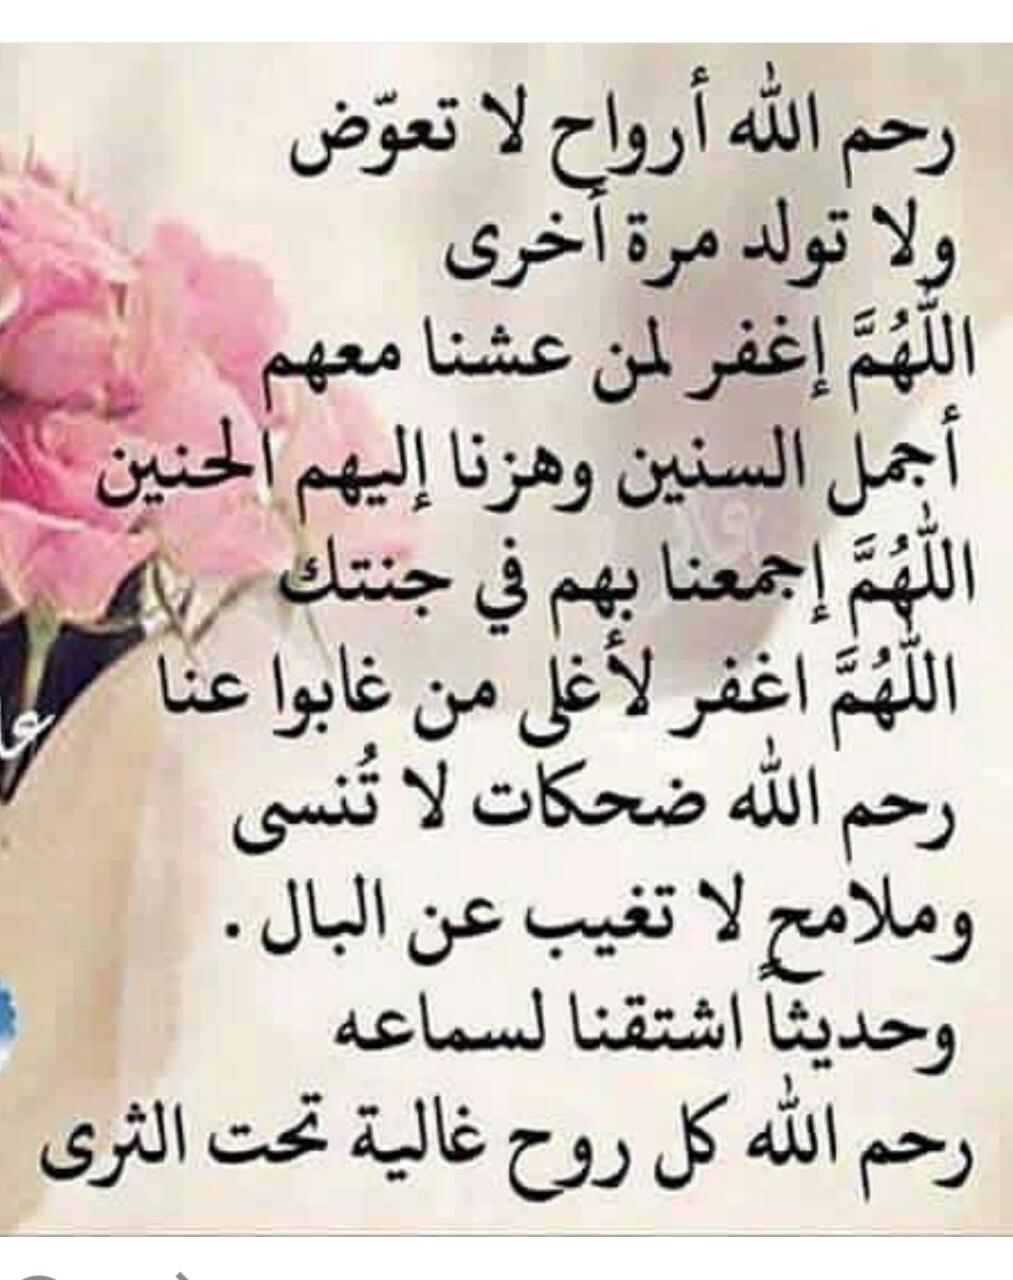 Pin By زهرة علي On اللهم صل على محمد وآل محمد وعجل فرجهم Sweet Quotes Dad Quotes Islam Facts